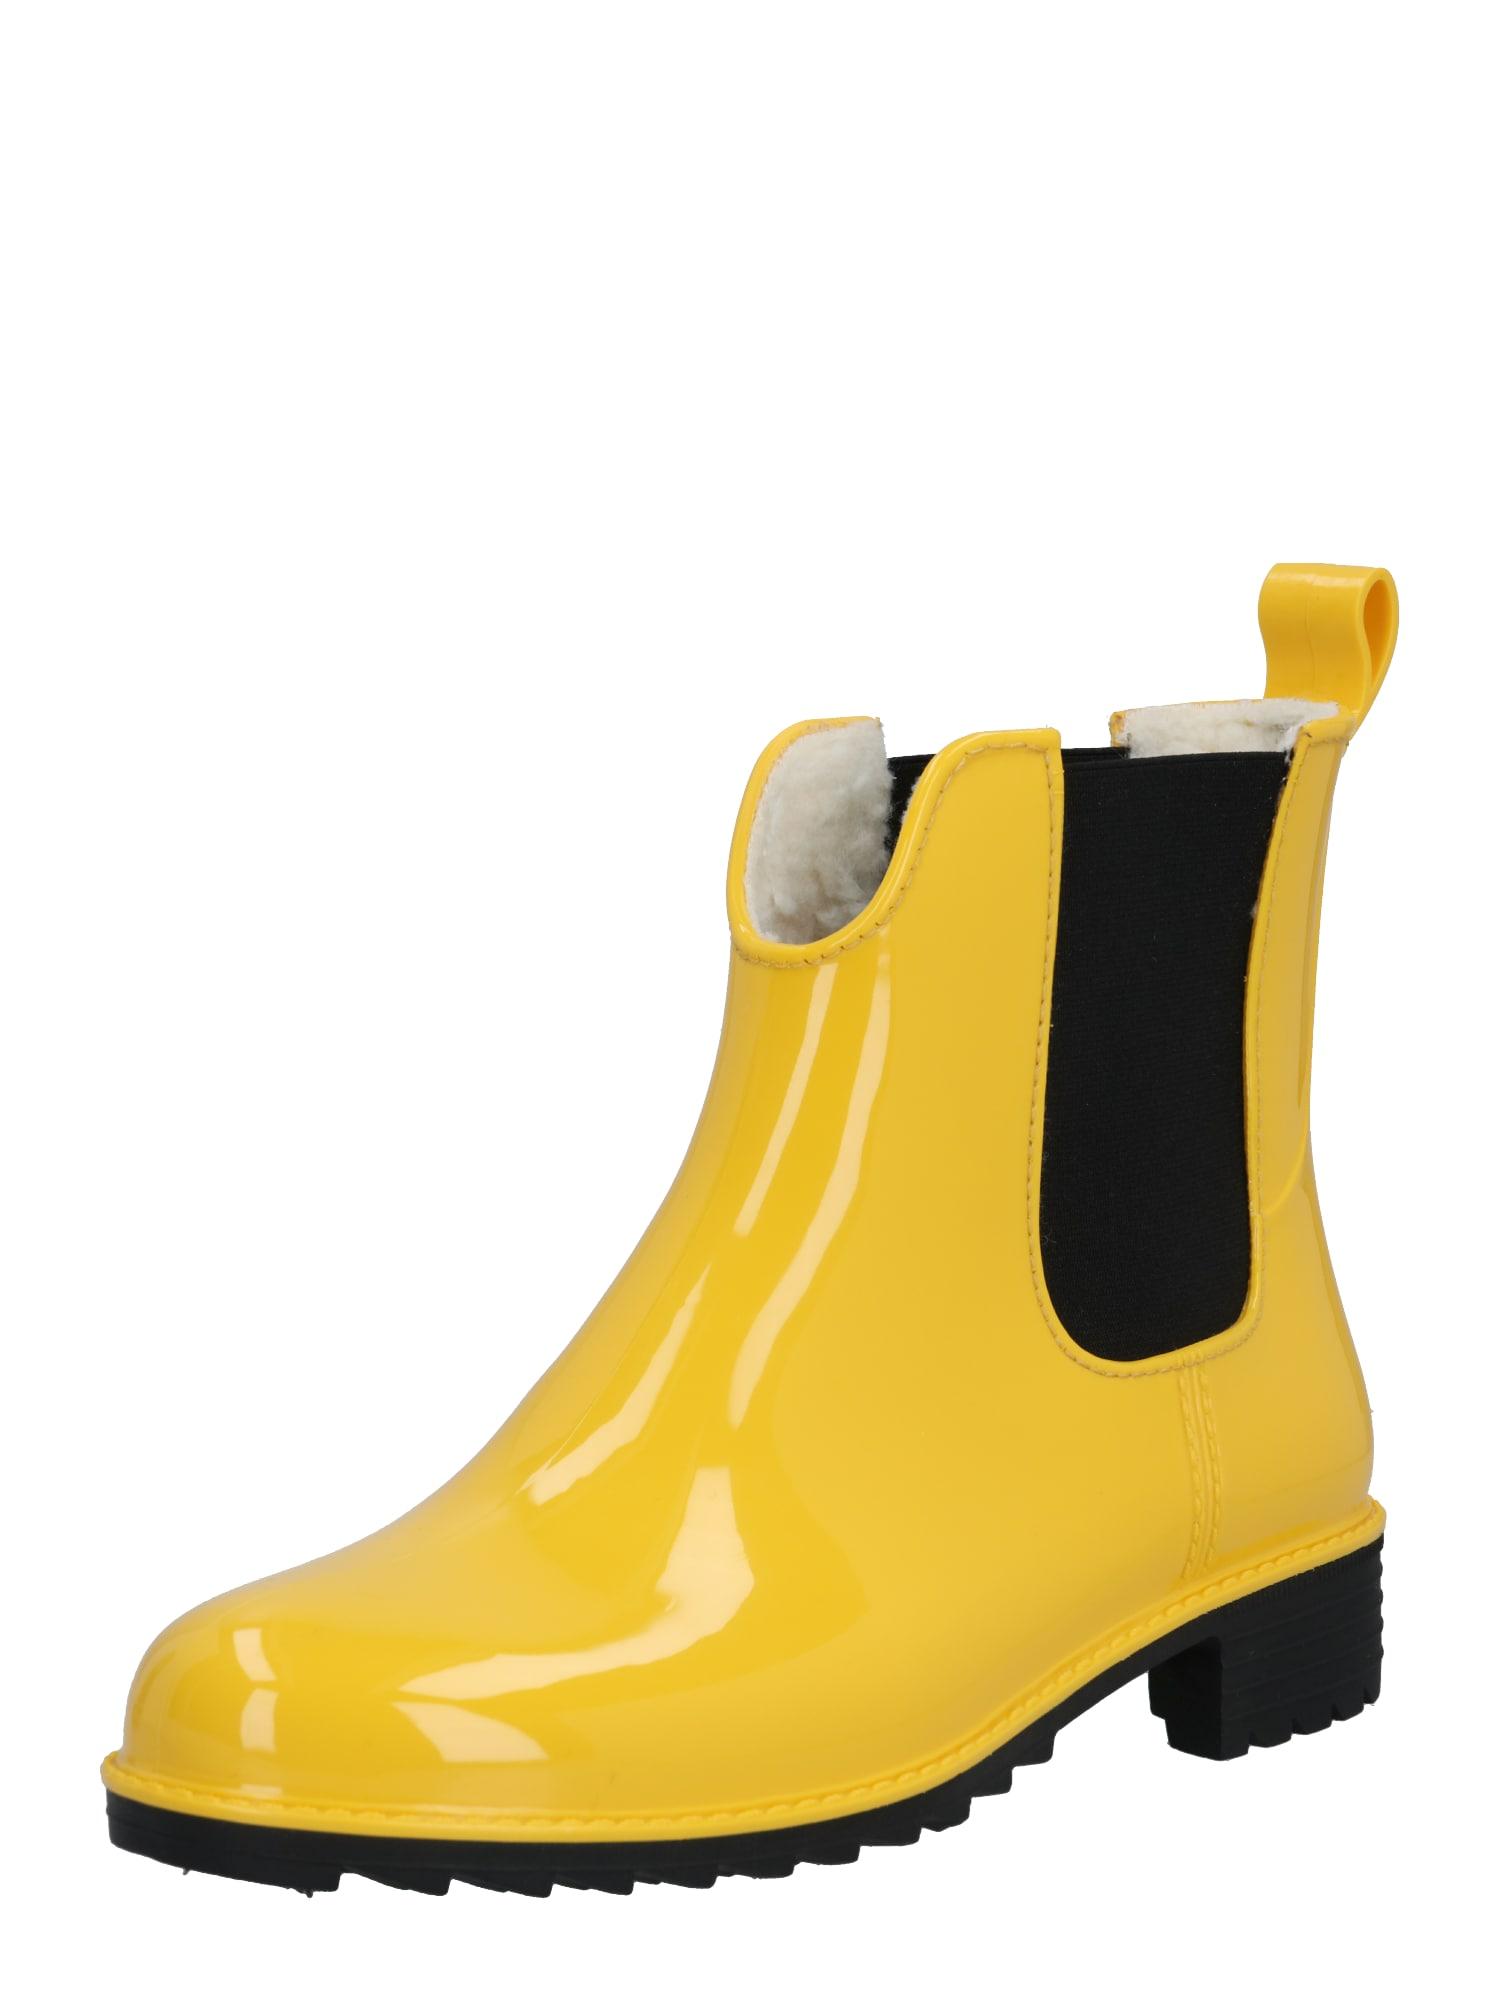 RIEKER Guminiai batai geltona / juoda